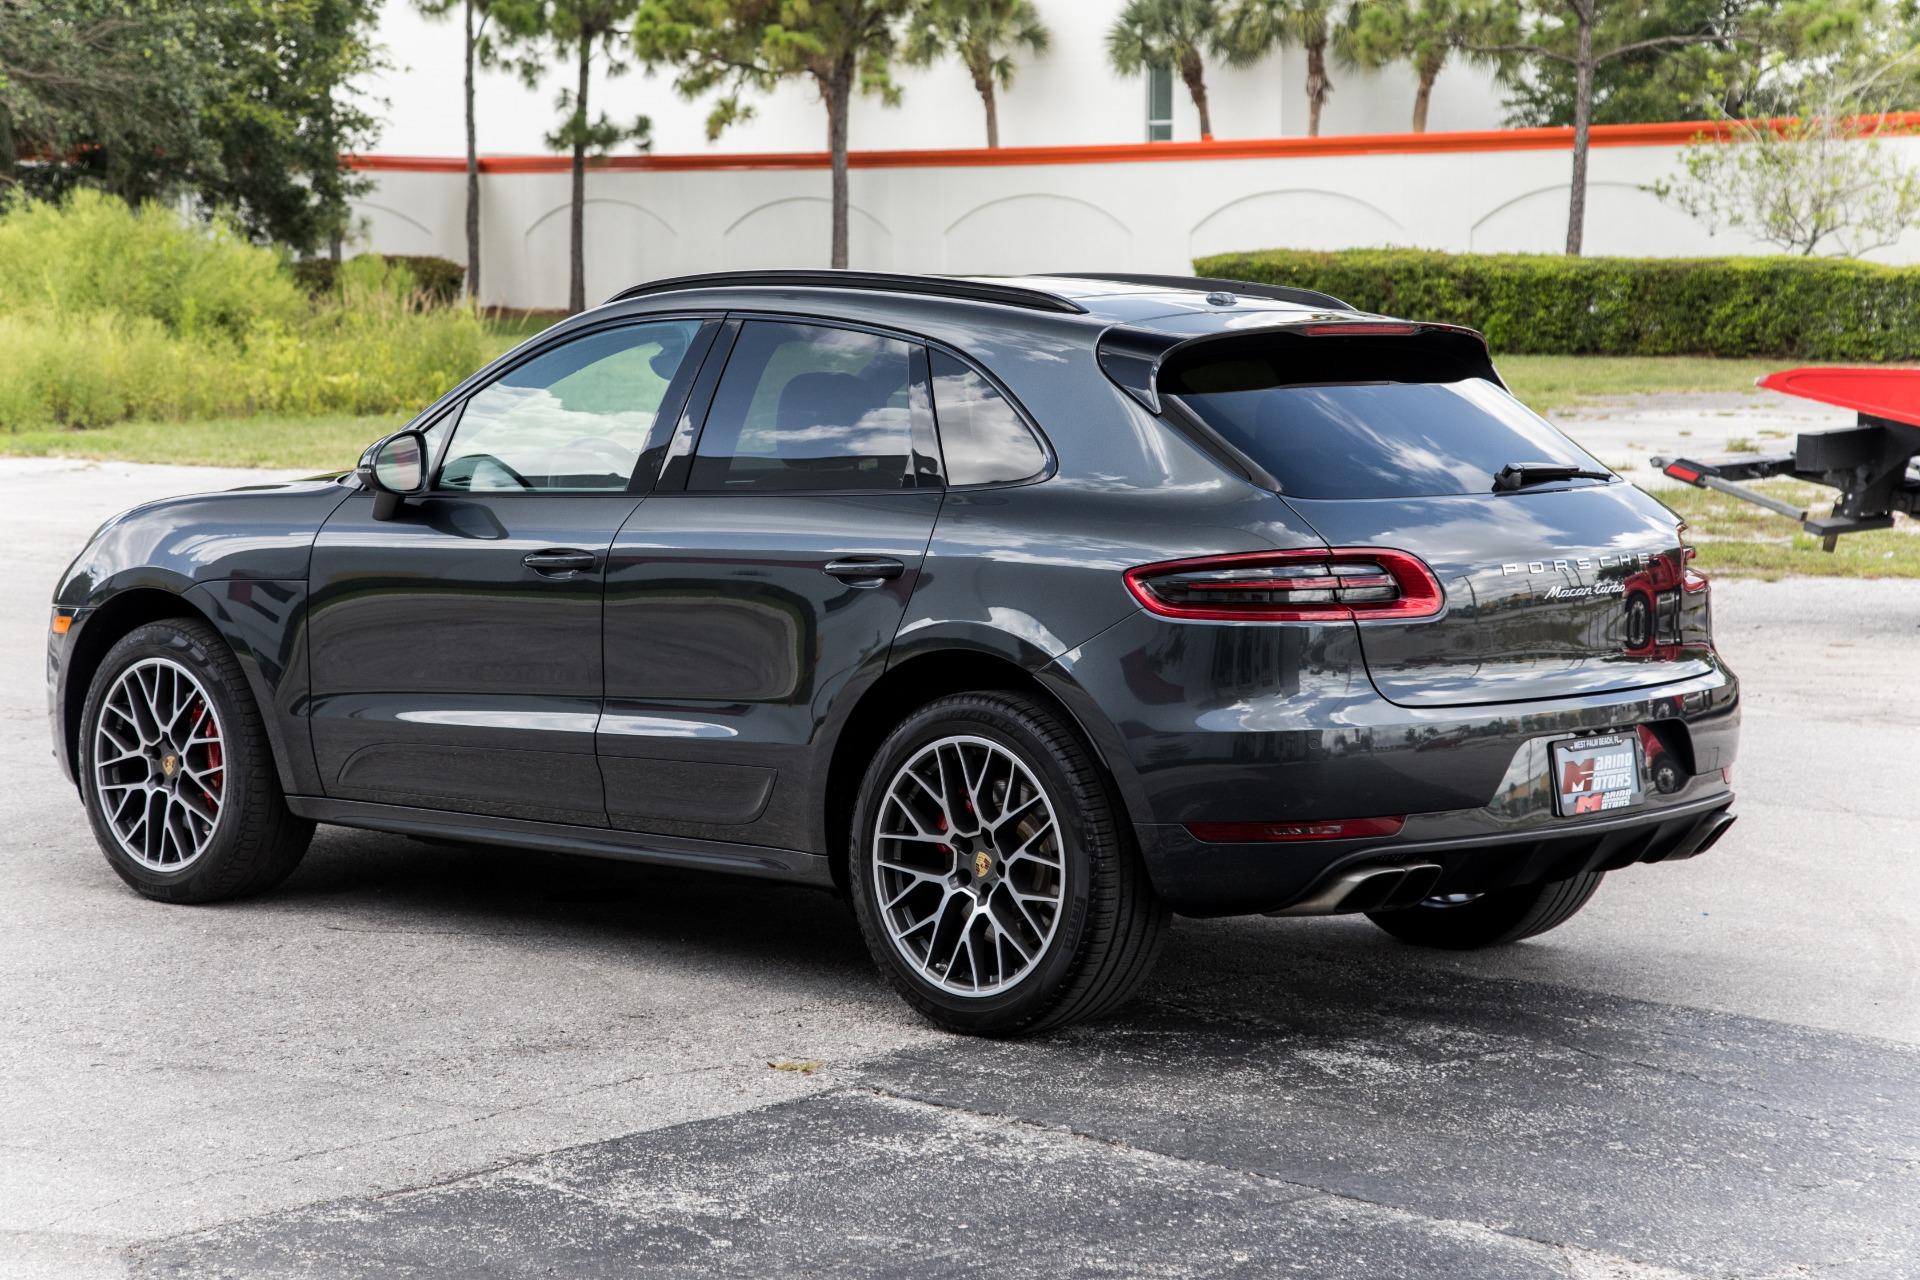 Used-2017-Porsche-Macan-Turbo